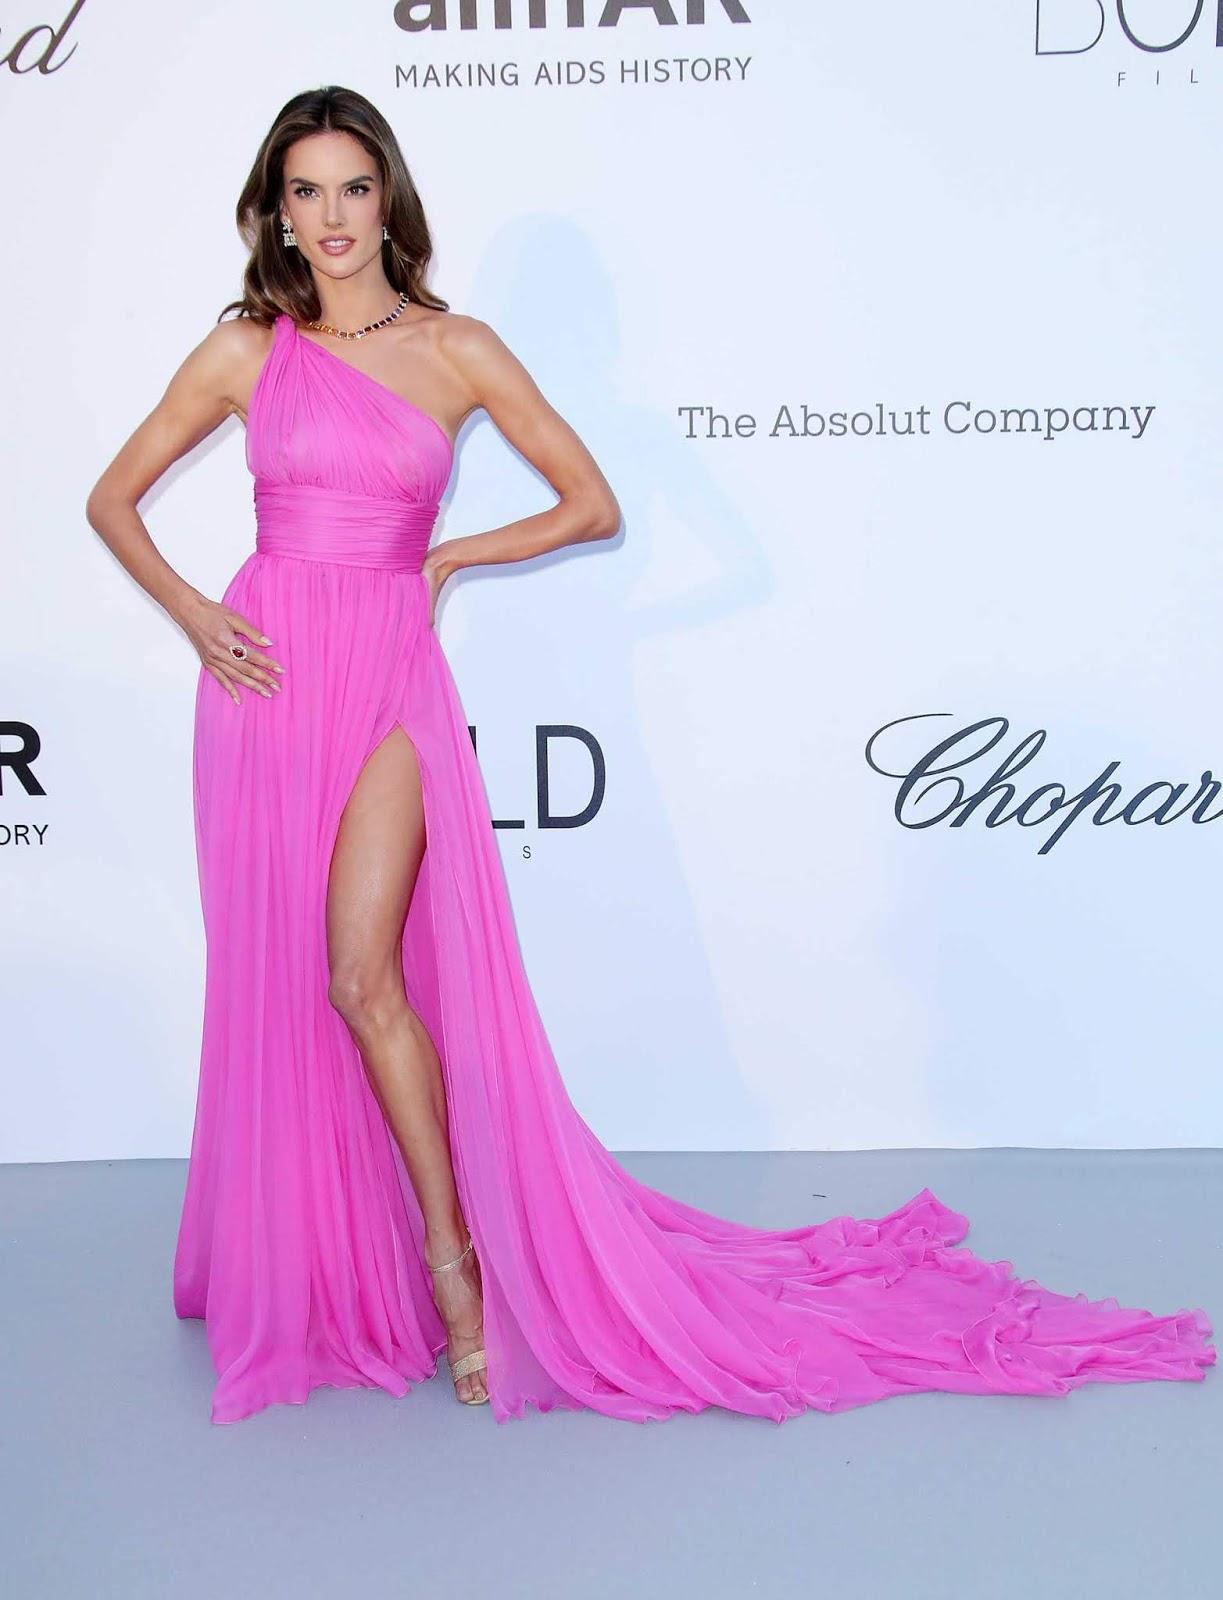 Contemporáneo Vestidos De Novia Con Acentos De Color Púrpura Modelo ...